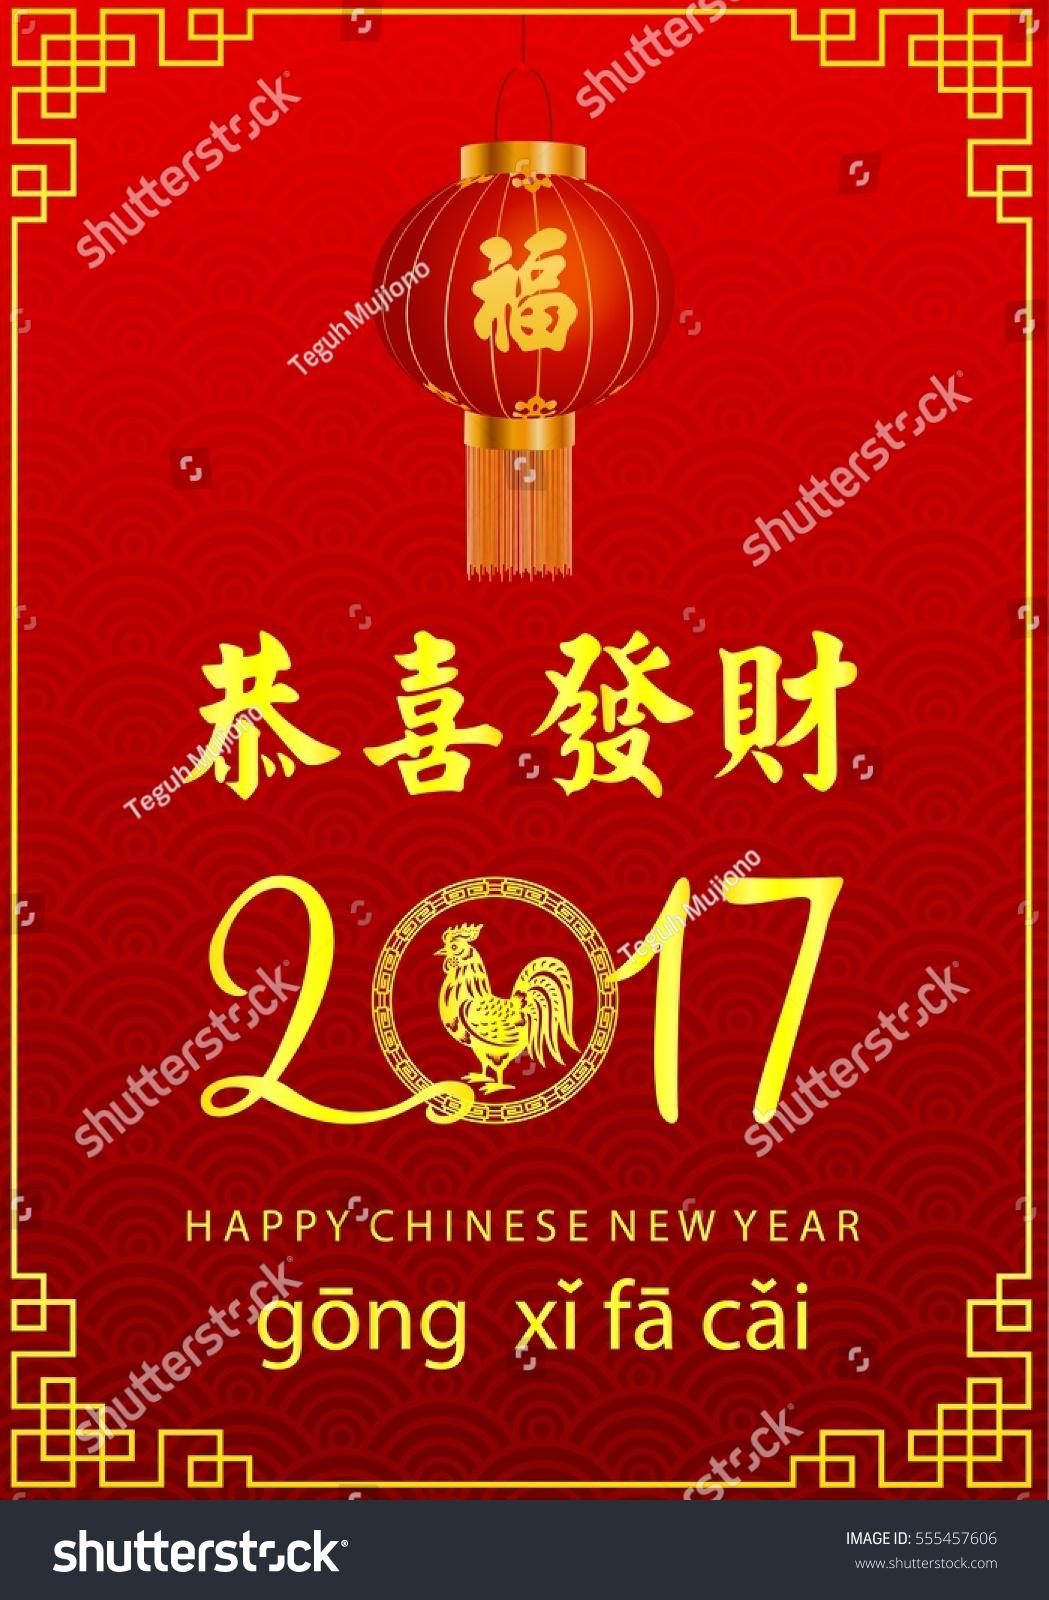 Happy chinese new year 2017 card stock photo 555457606 shutterstock